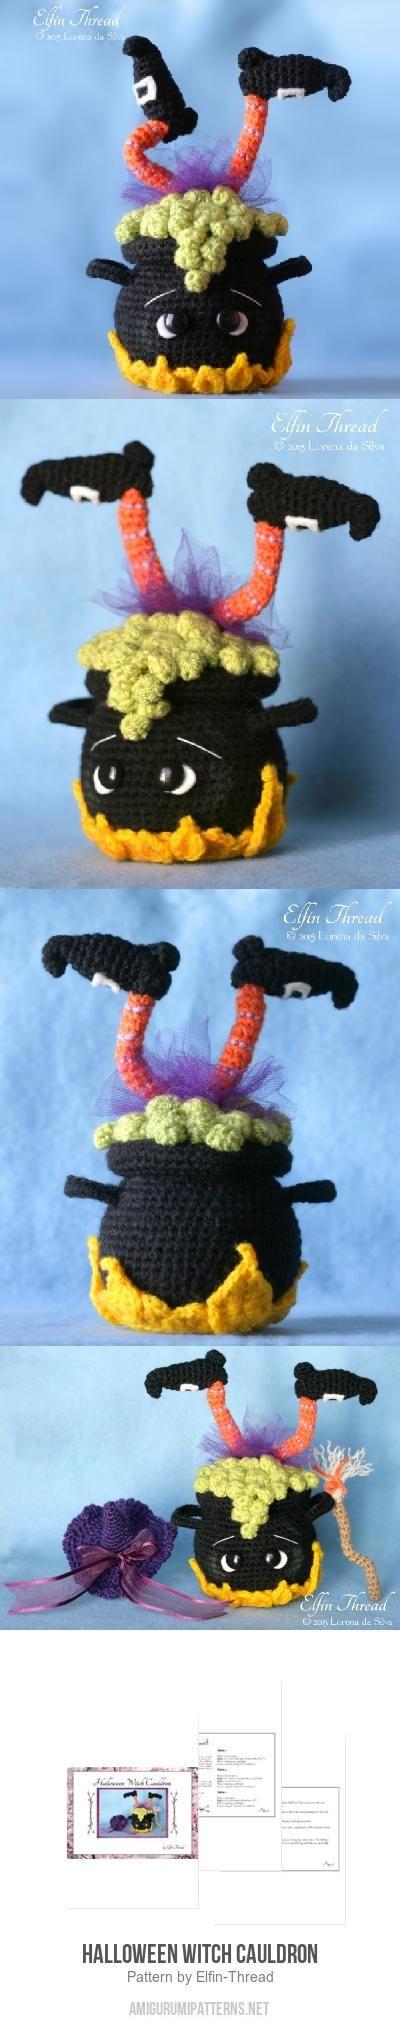 Halloween Witch Cauldron Amigurumi Pattern